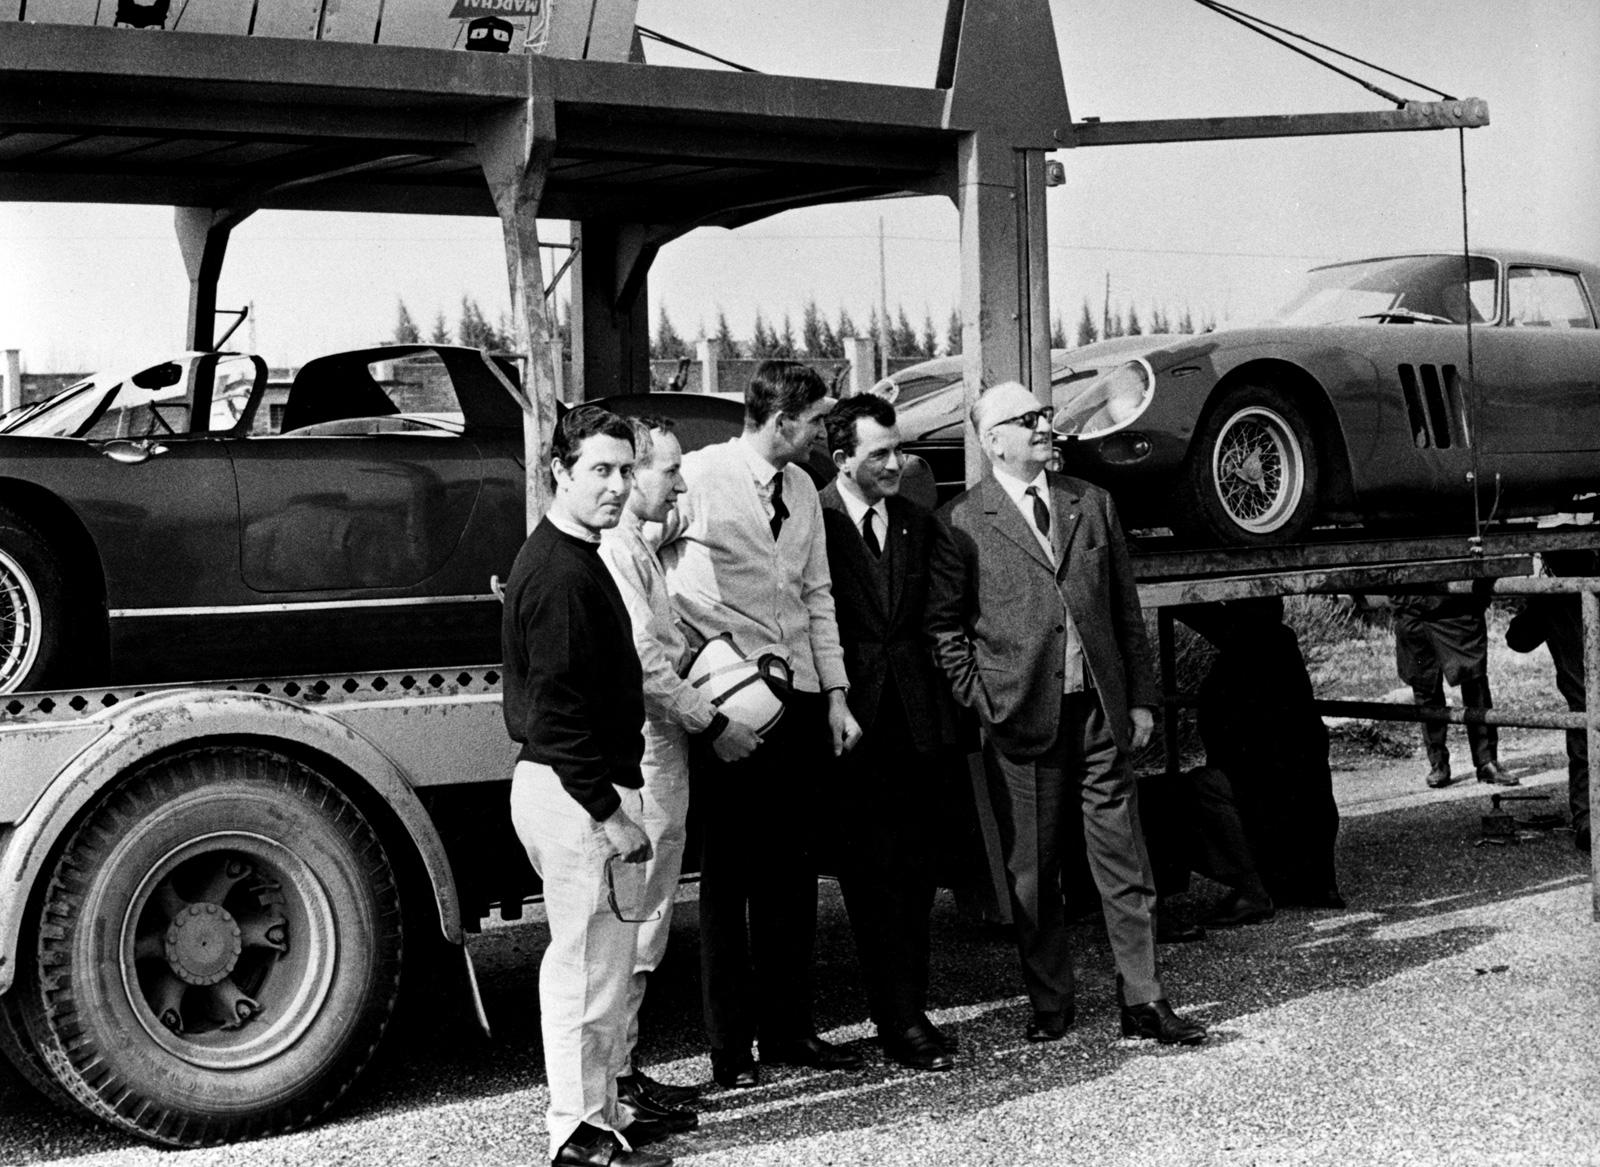 Enzo Ferrari Museum Celebrates Founder's 120th Birthday